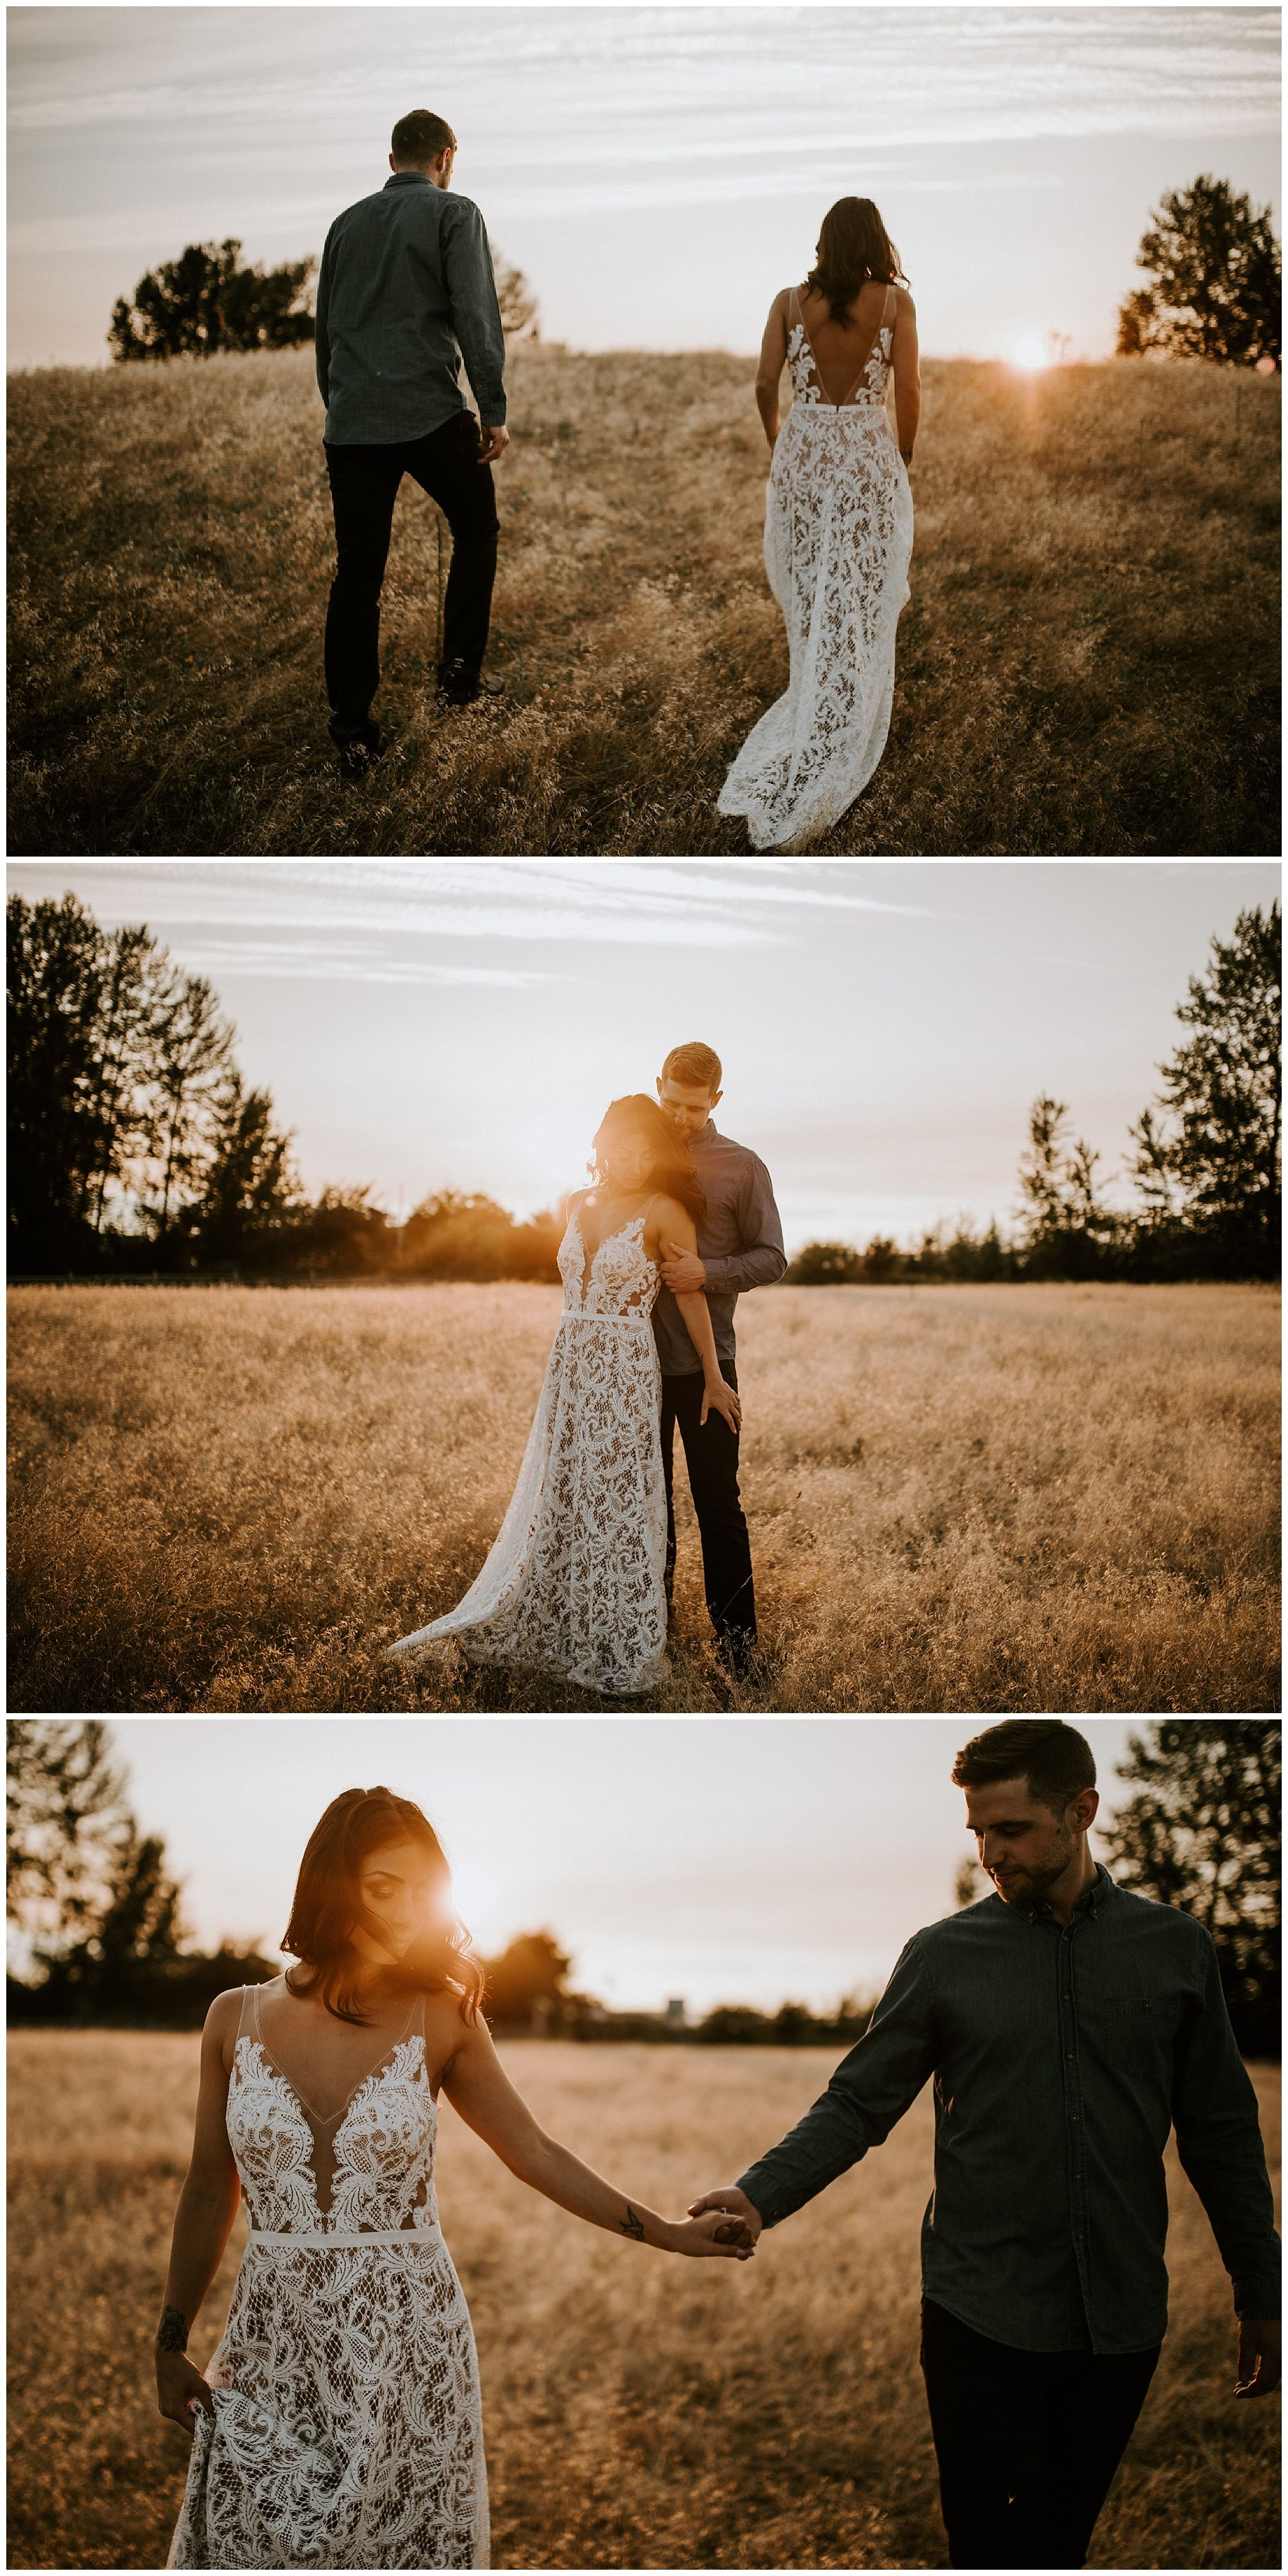 27+ White dress engagement photos info